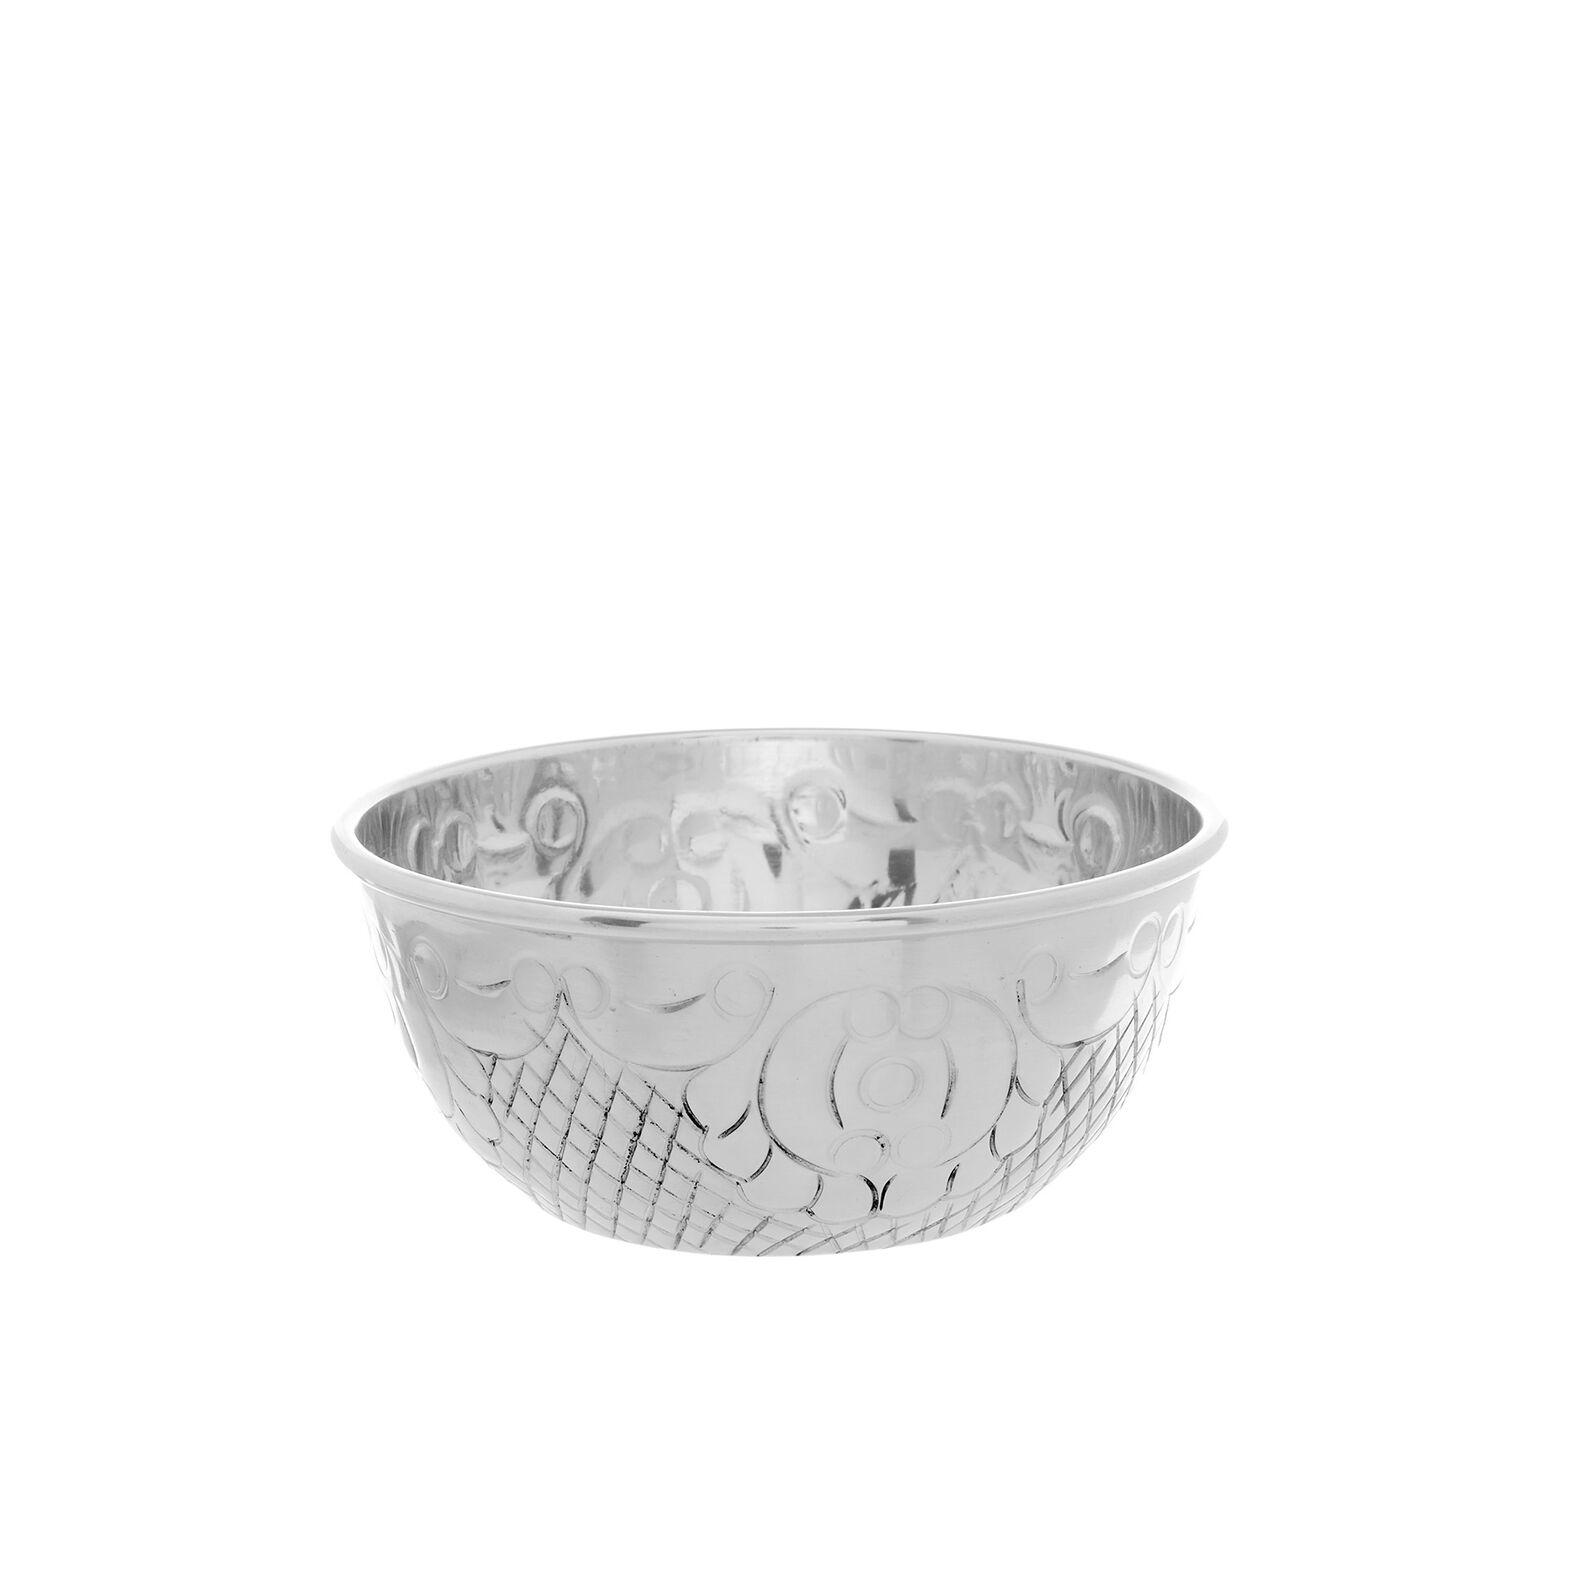 Small aluminium Morocco bowl